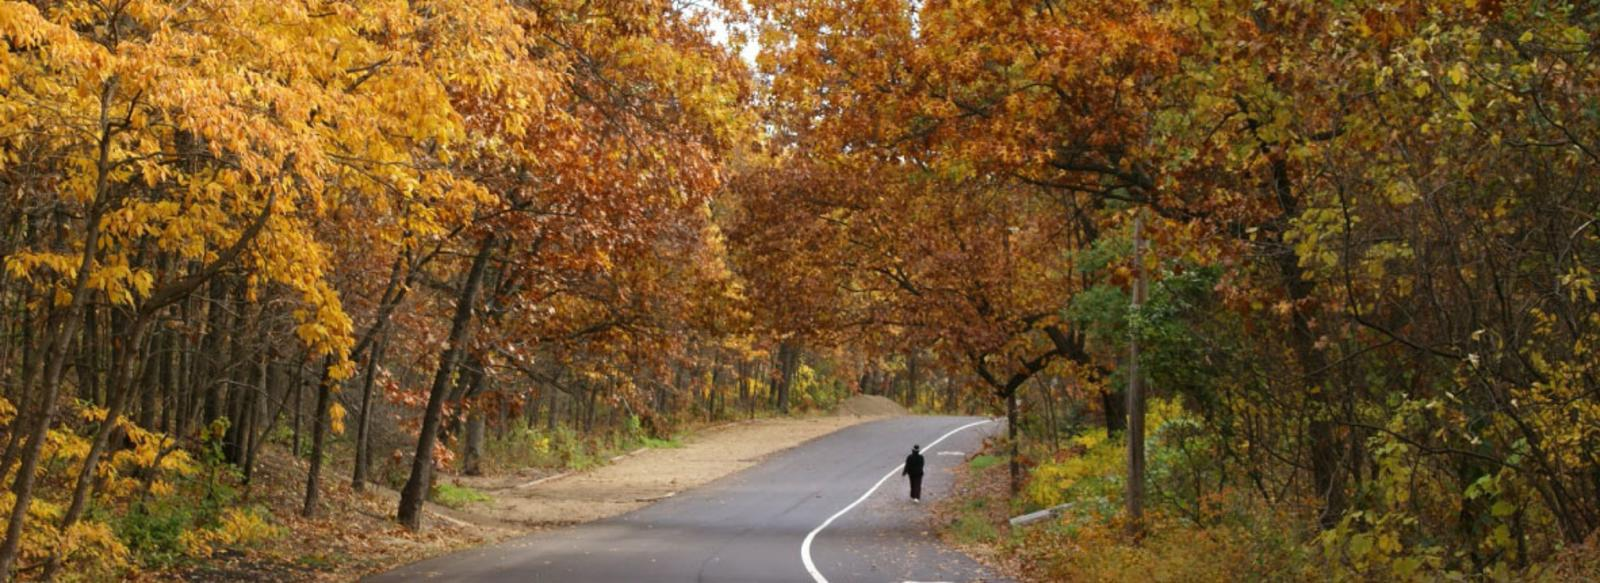 Marquette-Park-Northwest-Indiana-Trails-Gary